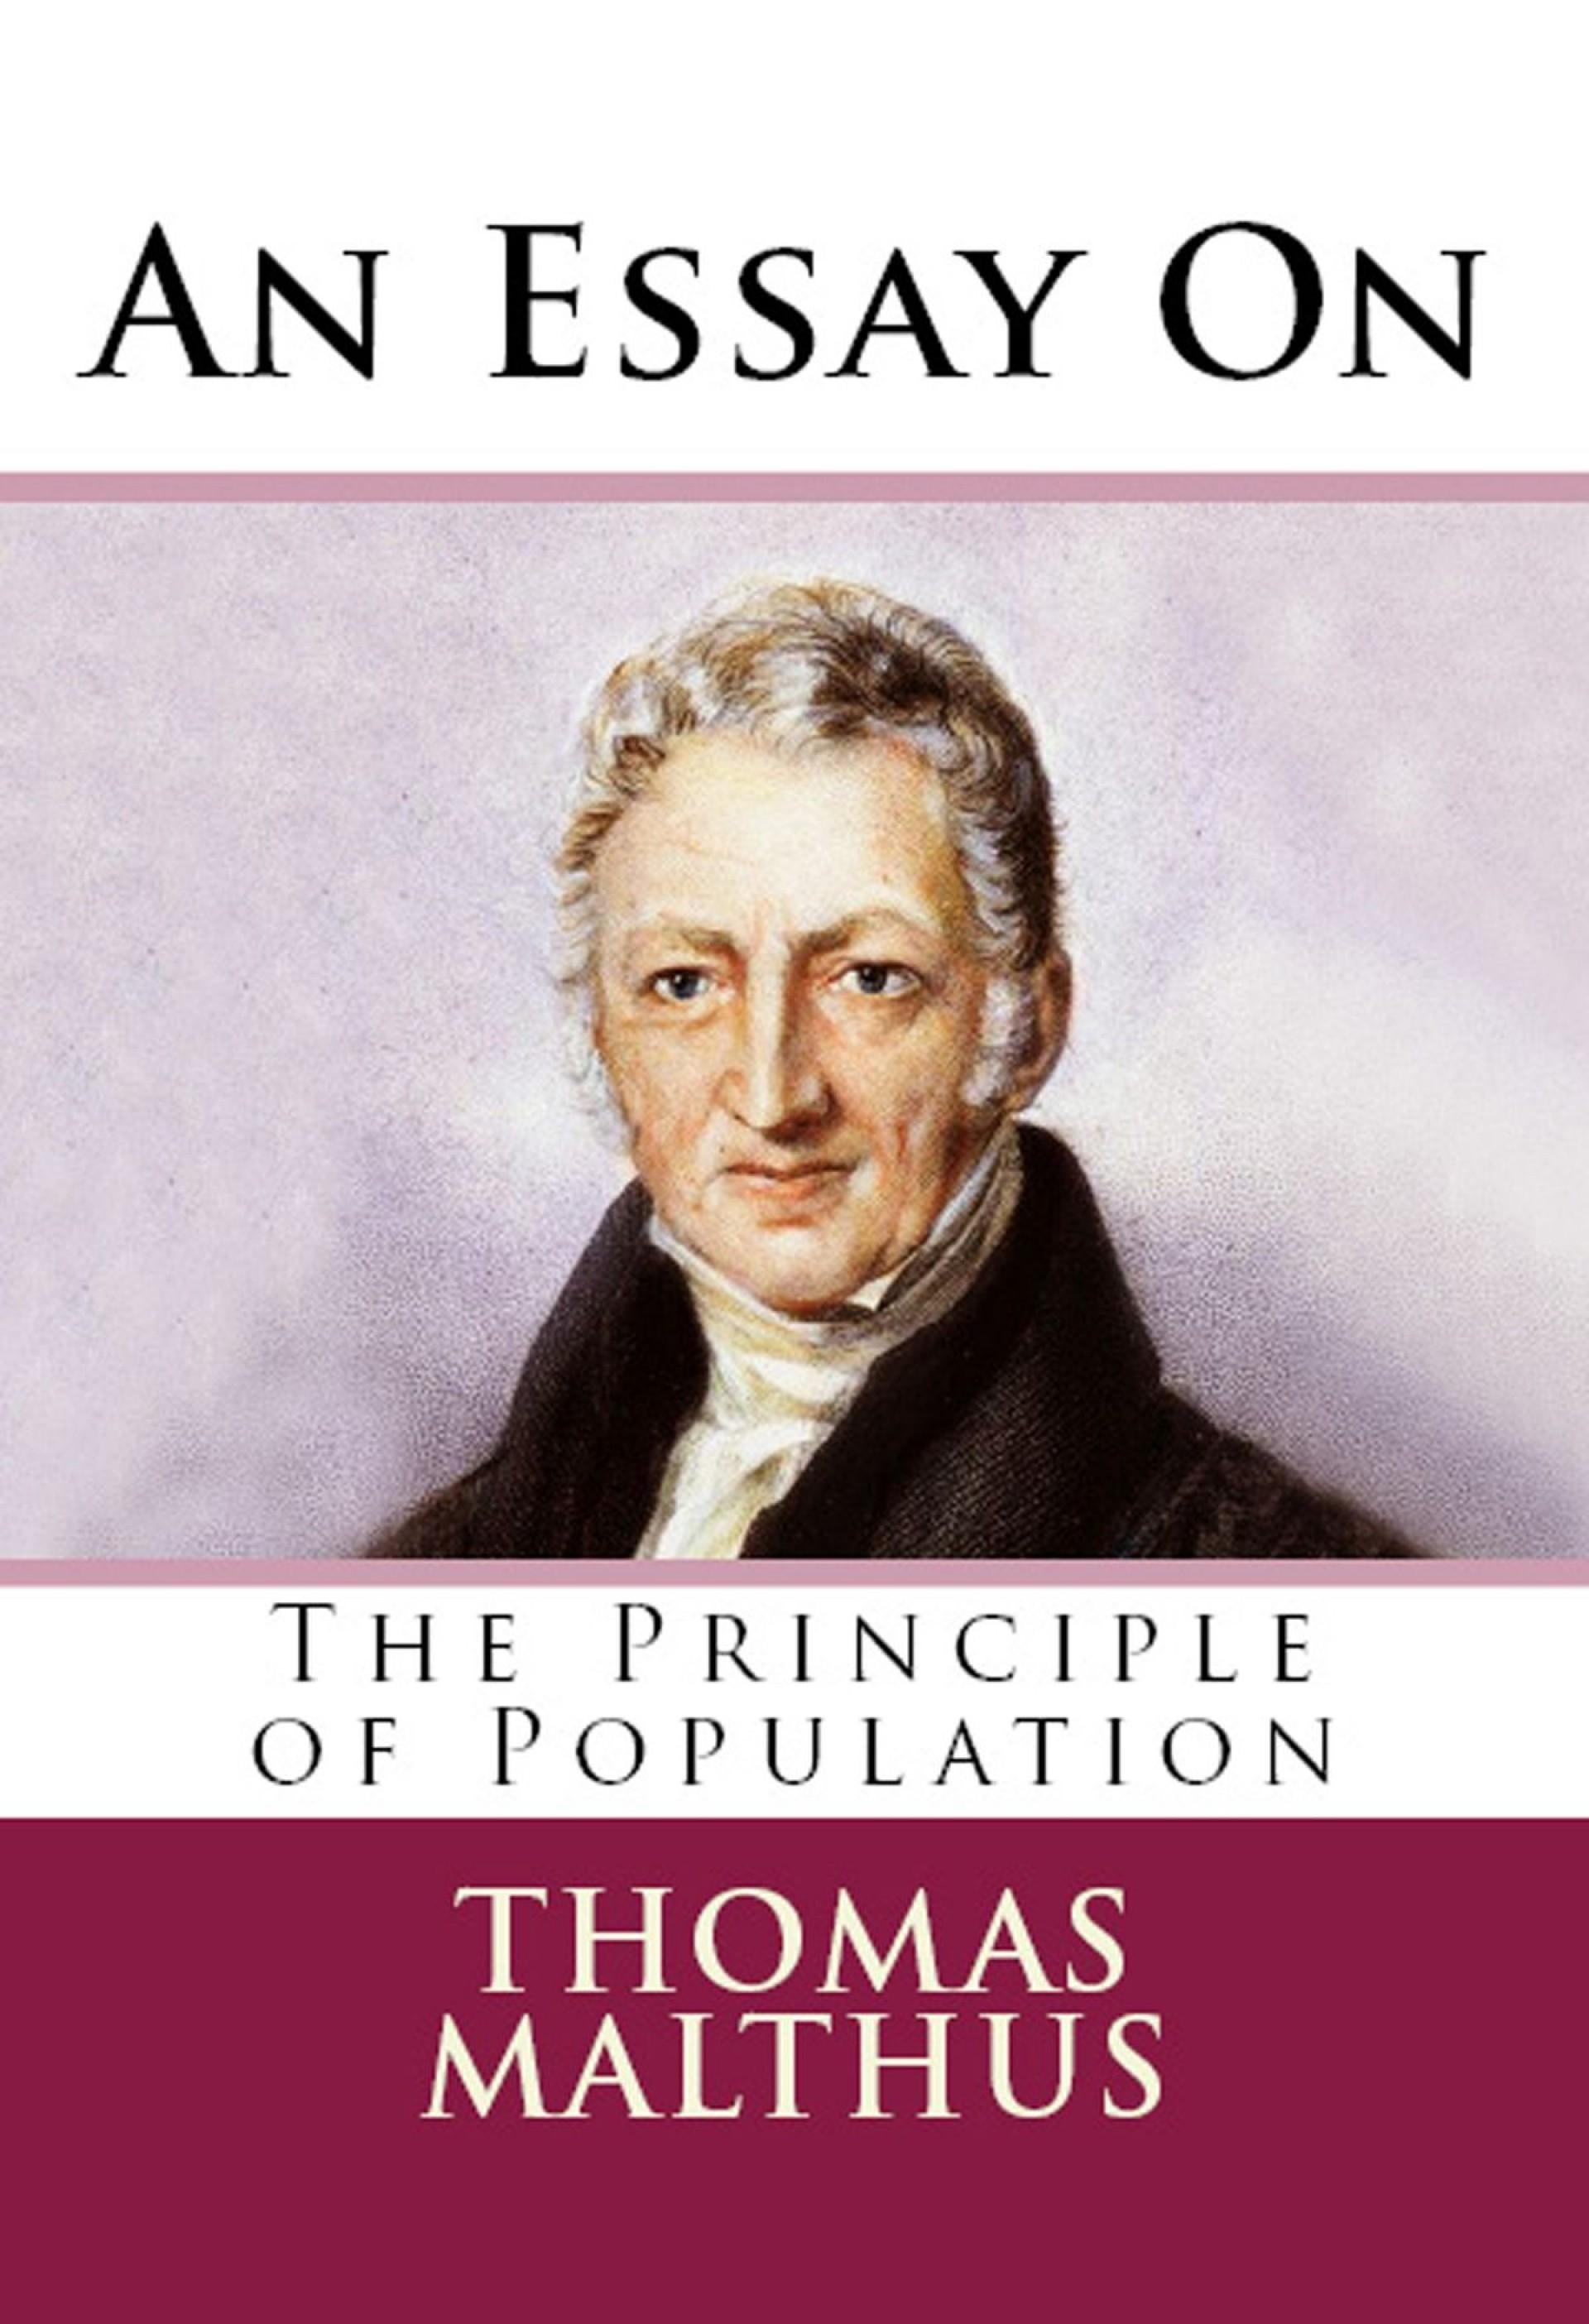 024 Essay Example An On The Principle Of Population Thomas Stupendous Malthus After Reading Malthus's Principles Darwin Got Idea That Ap Euro 1920